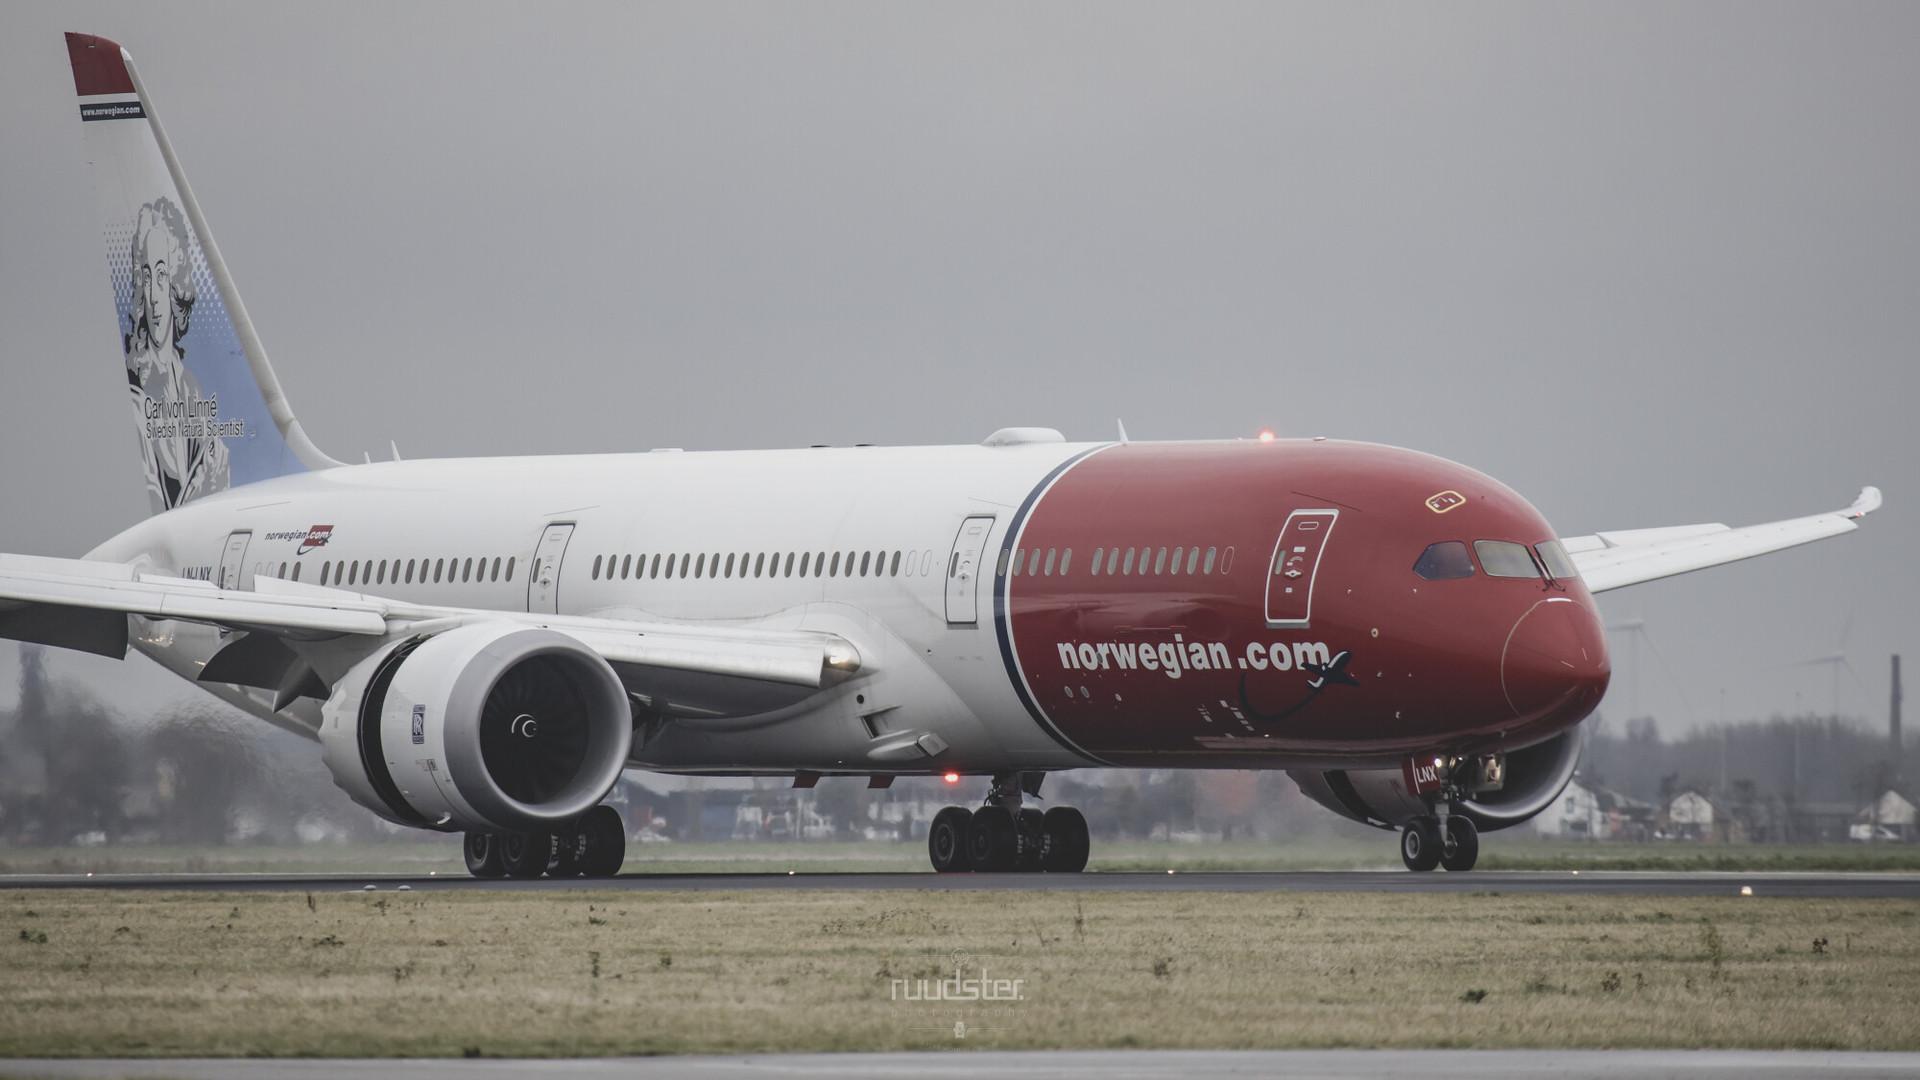 LN-LNX | Build: 2017 - Boeing 787-9